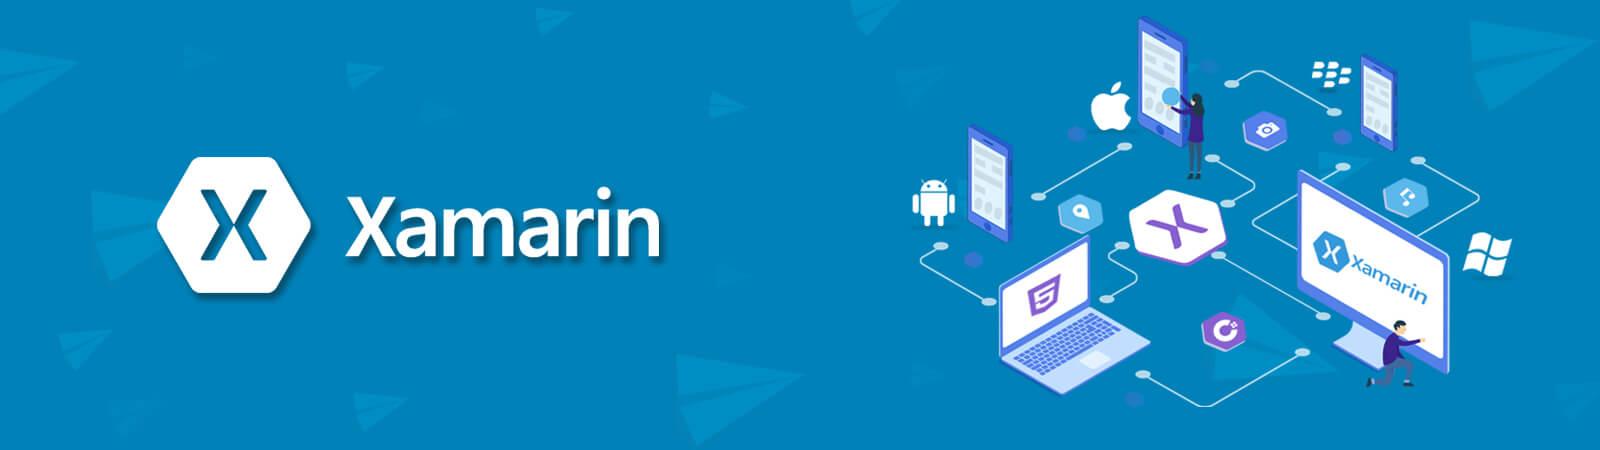 xamarin-application-development